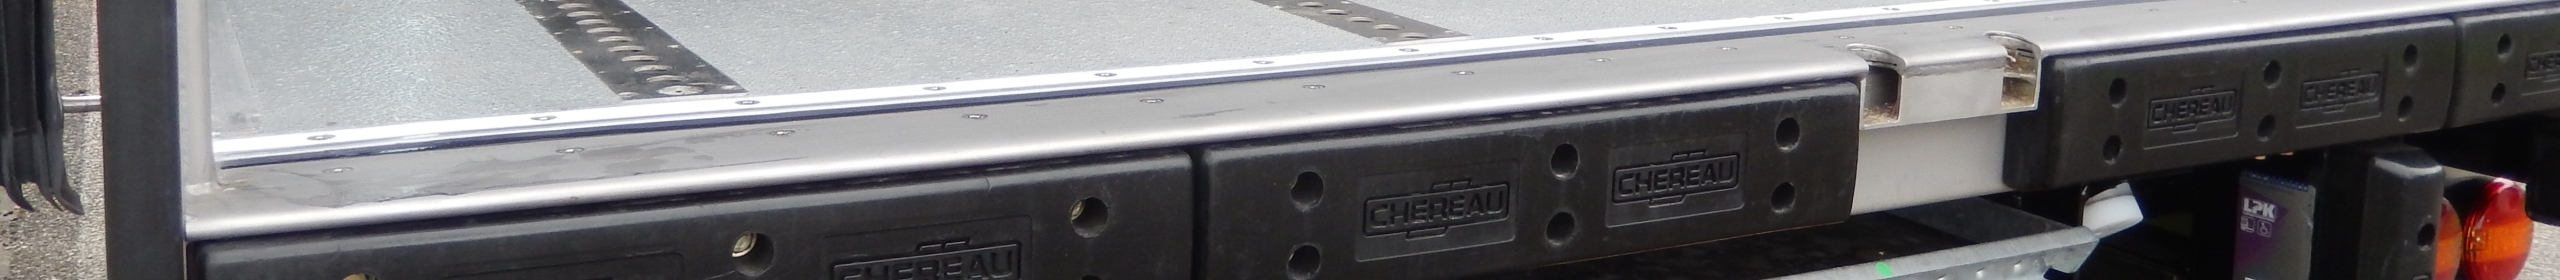 Chereau koel/vries carrosserieën